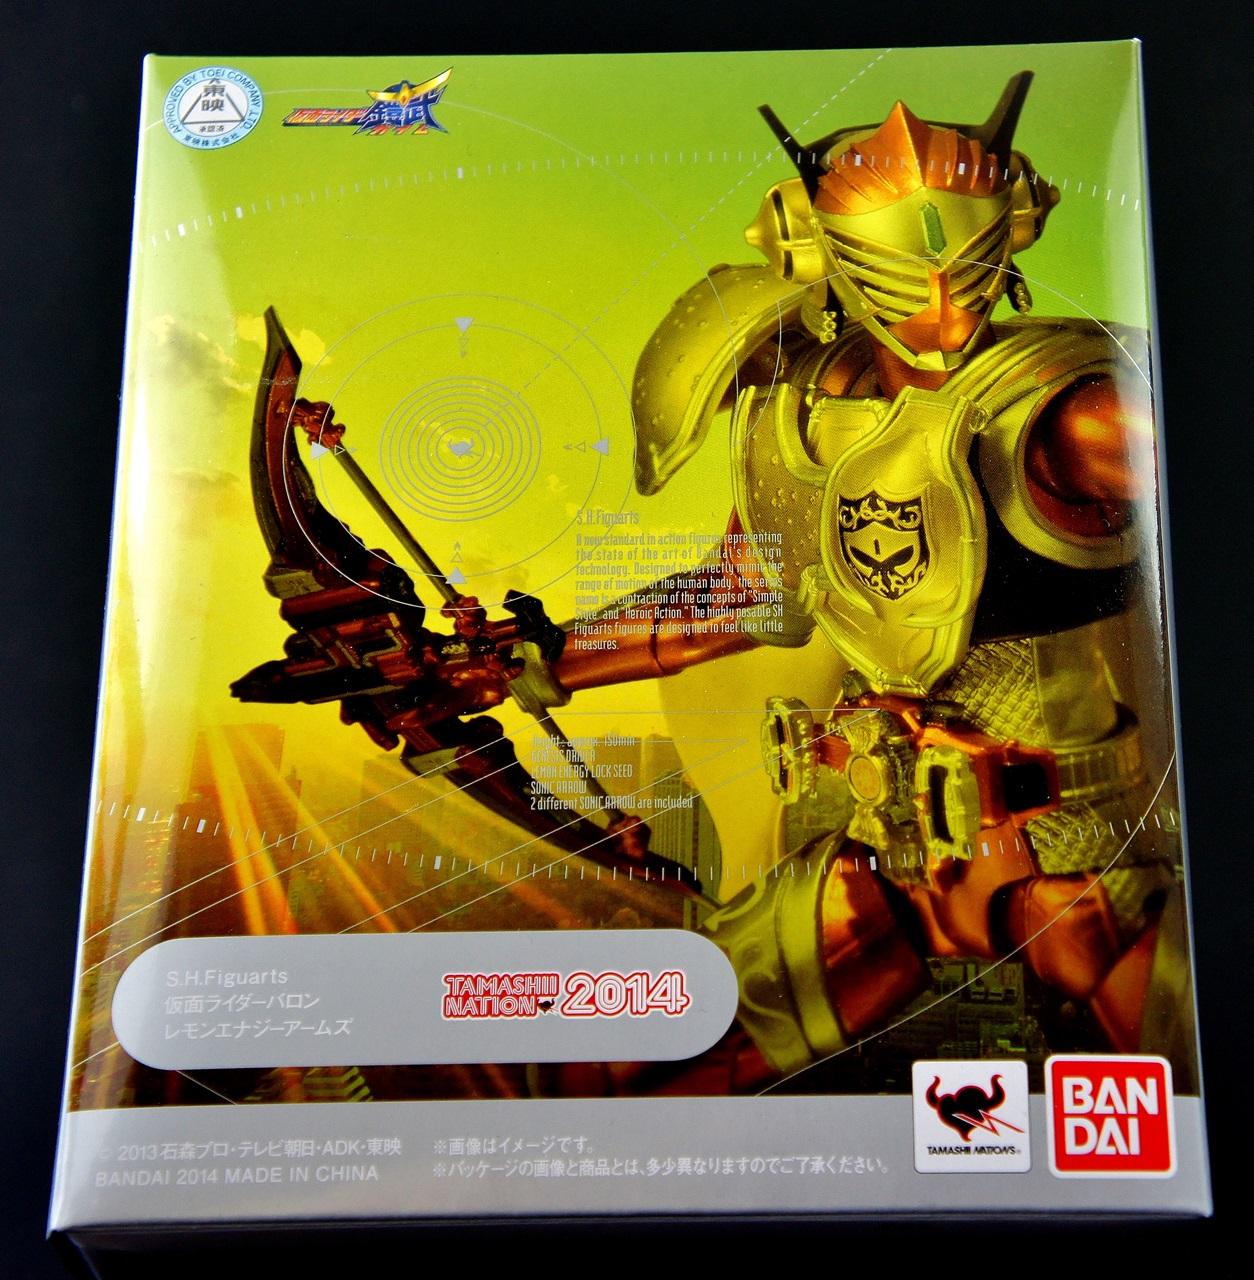 S.H. Figuarts Kamen Rider Baron Lemon Energy Arms Gallery ...